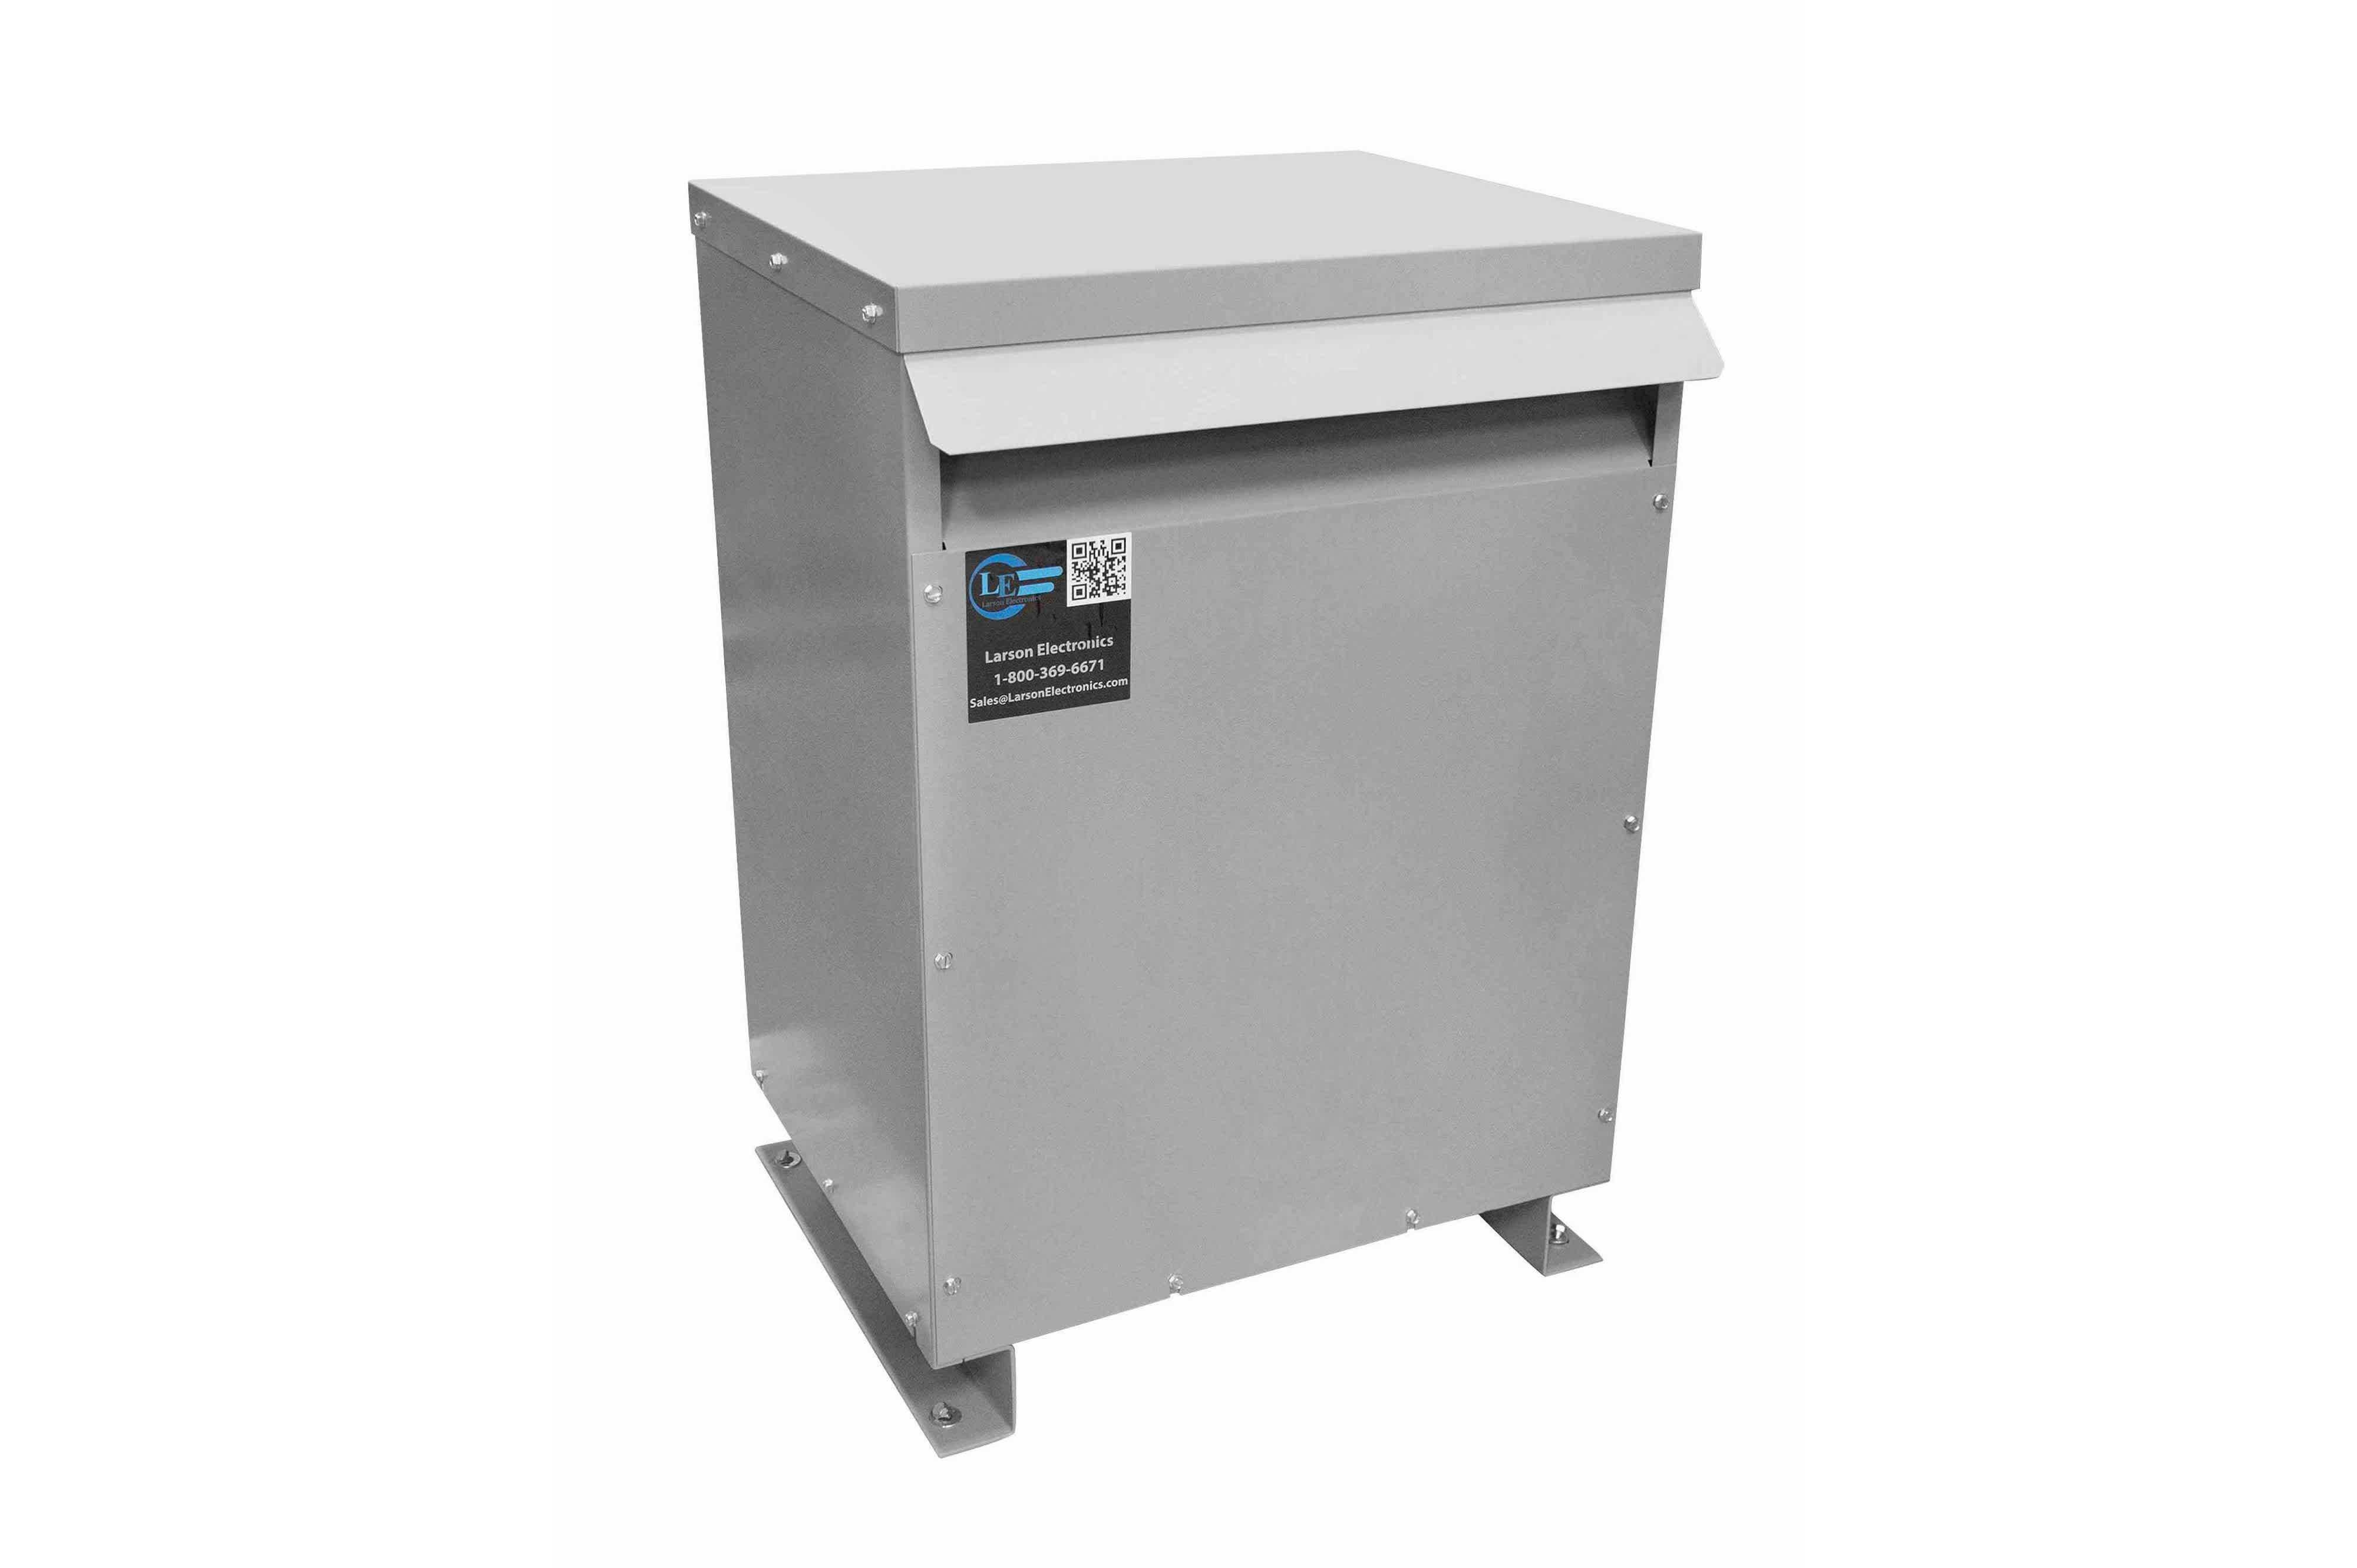 47.5 kVA 3PH Isolation Transformer, 460V Wye Primary, 600Y/347 Wye-N Secondary, N3R, Ventilated, 60 Hz